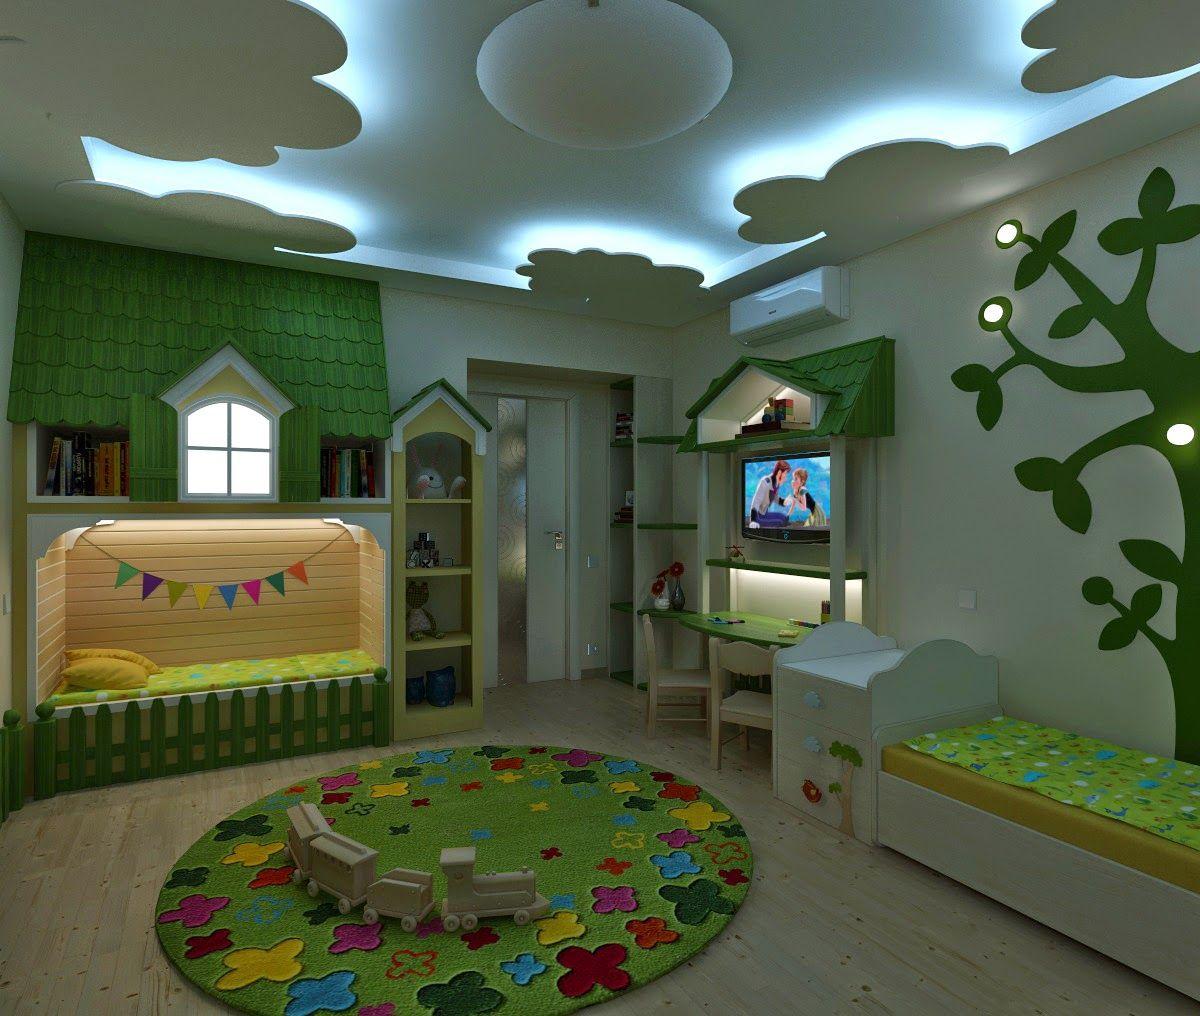 Teenage Bedroom Decor Diy Bedroom Colors And Designs Bedroom Ideas For Boys Bedroom Ceiling Wallpaper: Дизайн интерьера и 3D визуализация